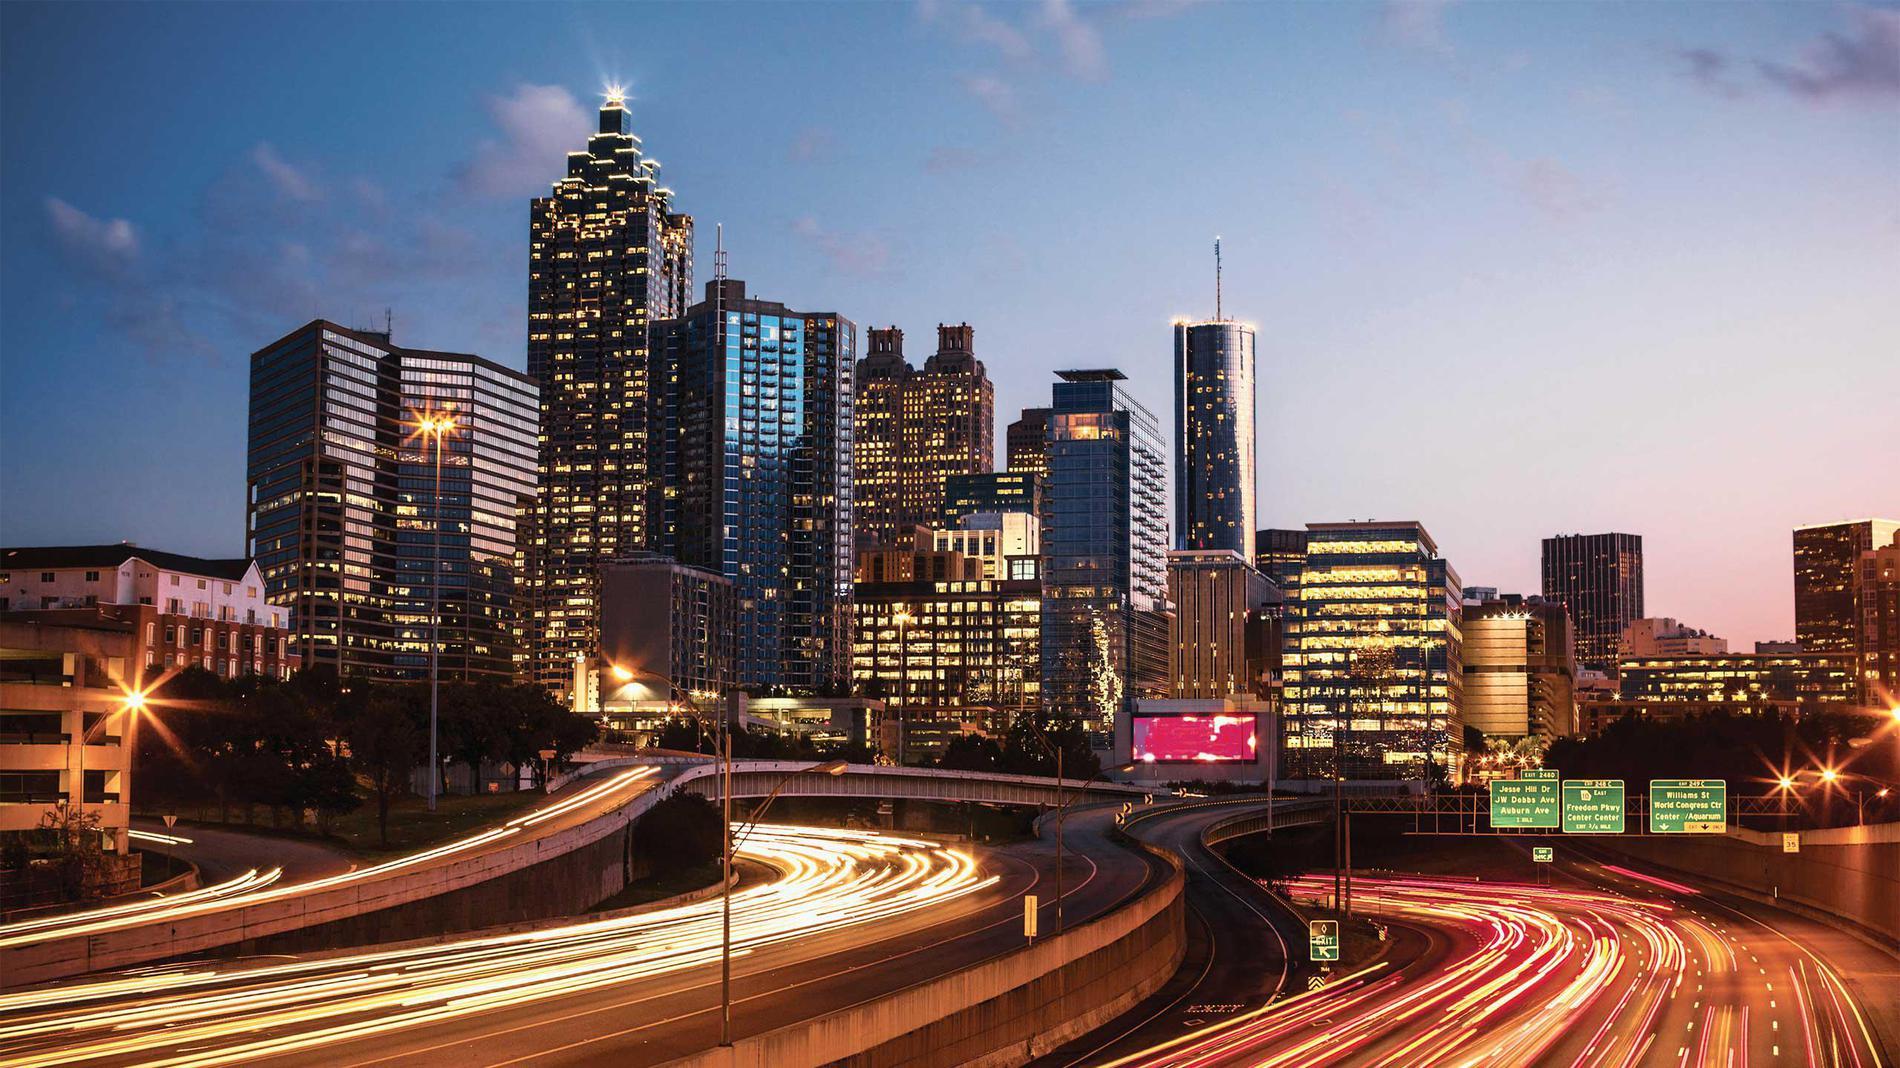 Morgan Stanley Greater Houston Area Complex Complex | Houston, TX